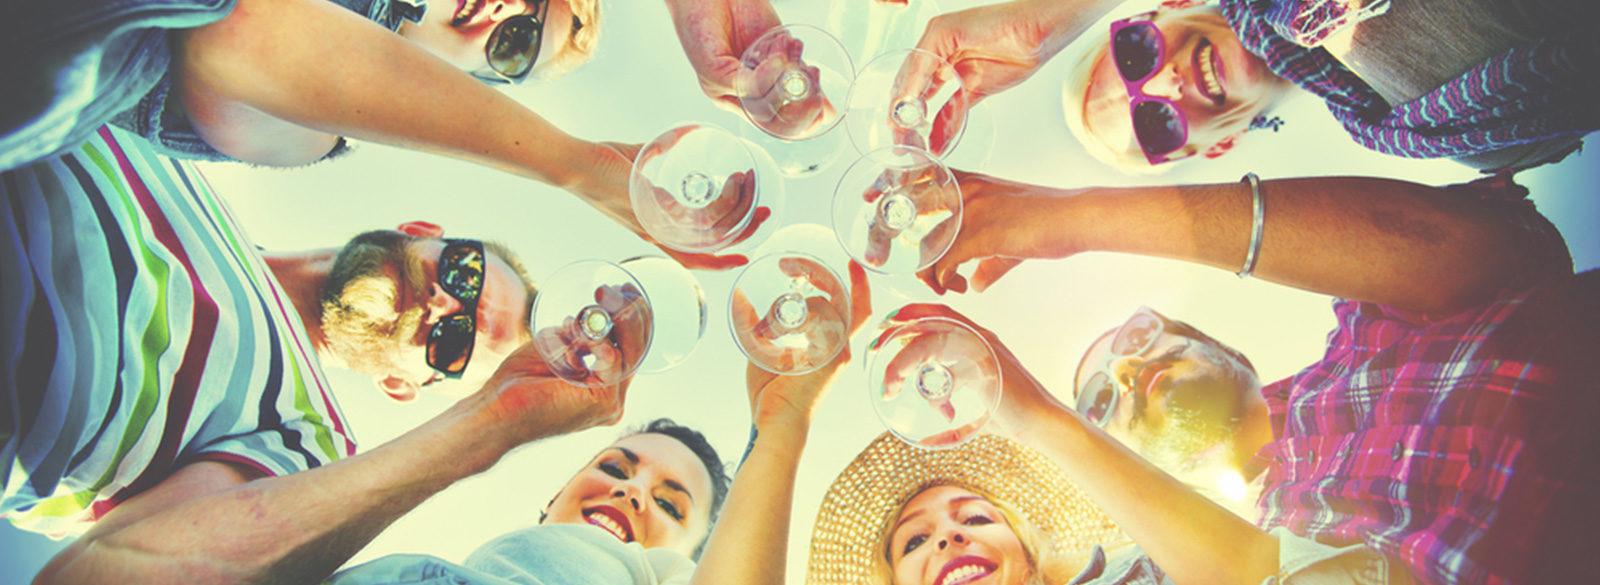 7 vinos para ser feliz en 2017